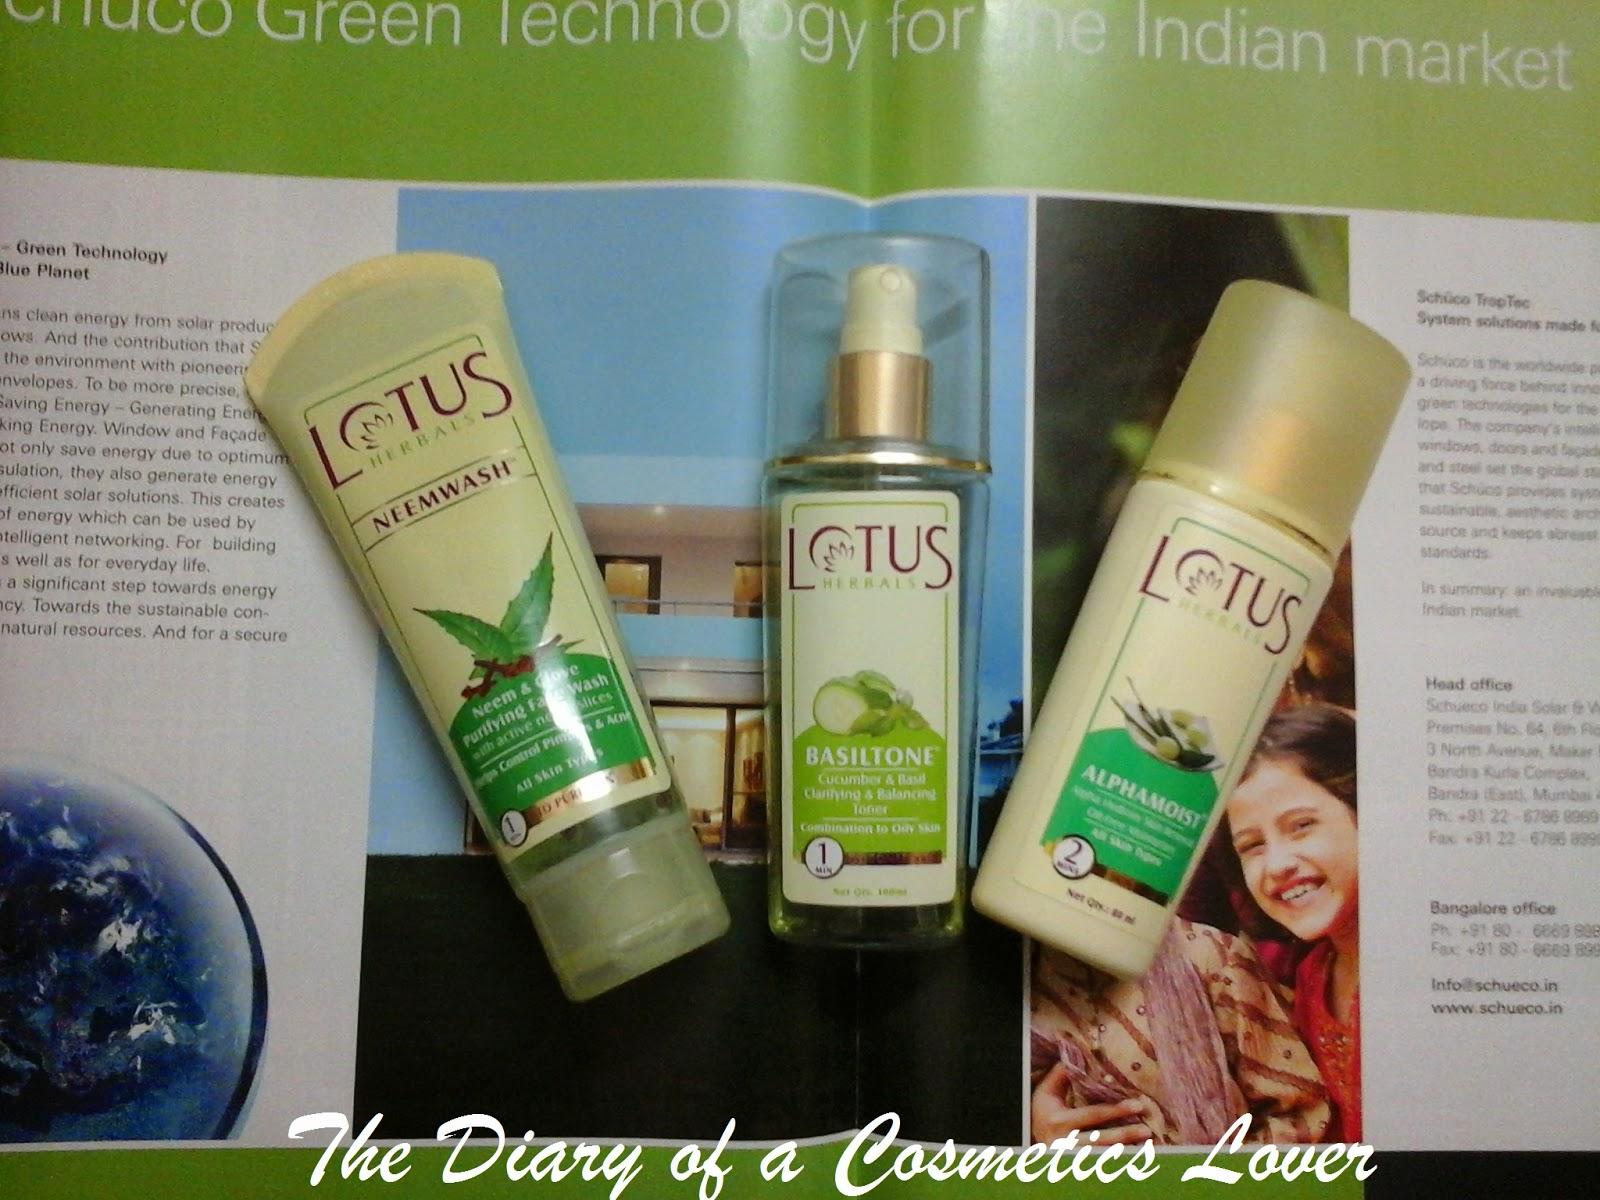 The Beauty Diaries: Lotus Herbals Neemwash Neem and Clove Ultra